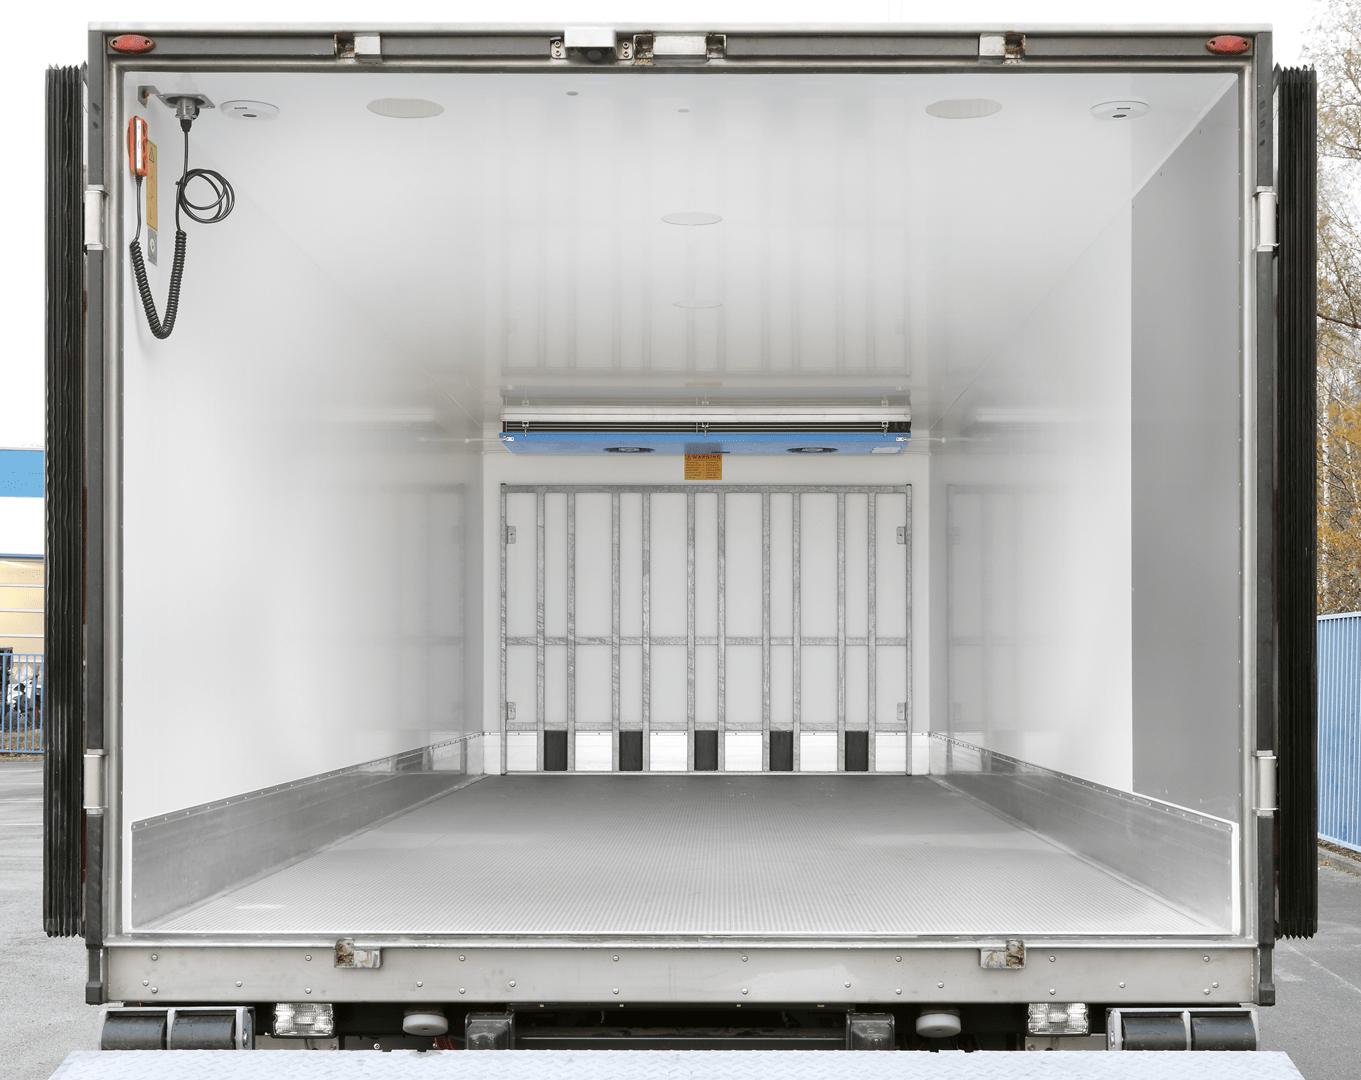 Michael Ward Limited Transport Refrigeration Unit